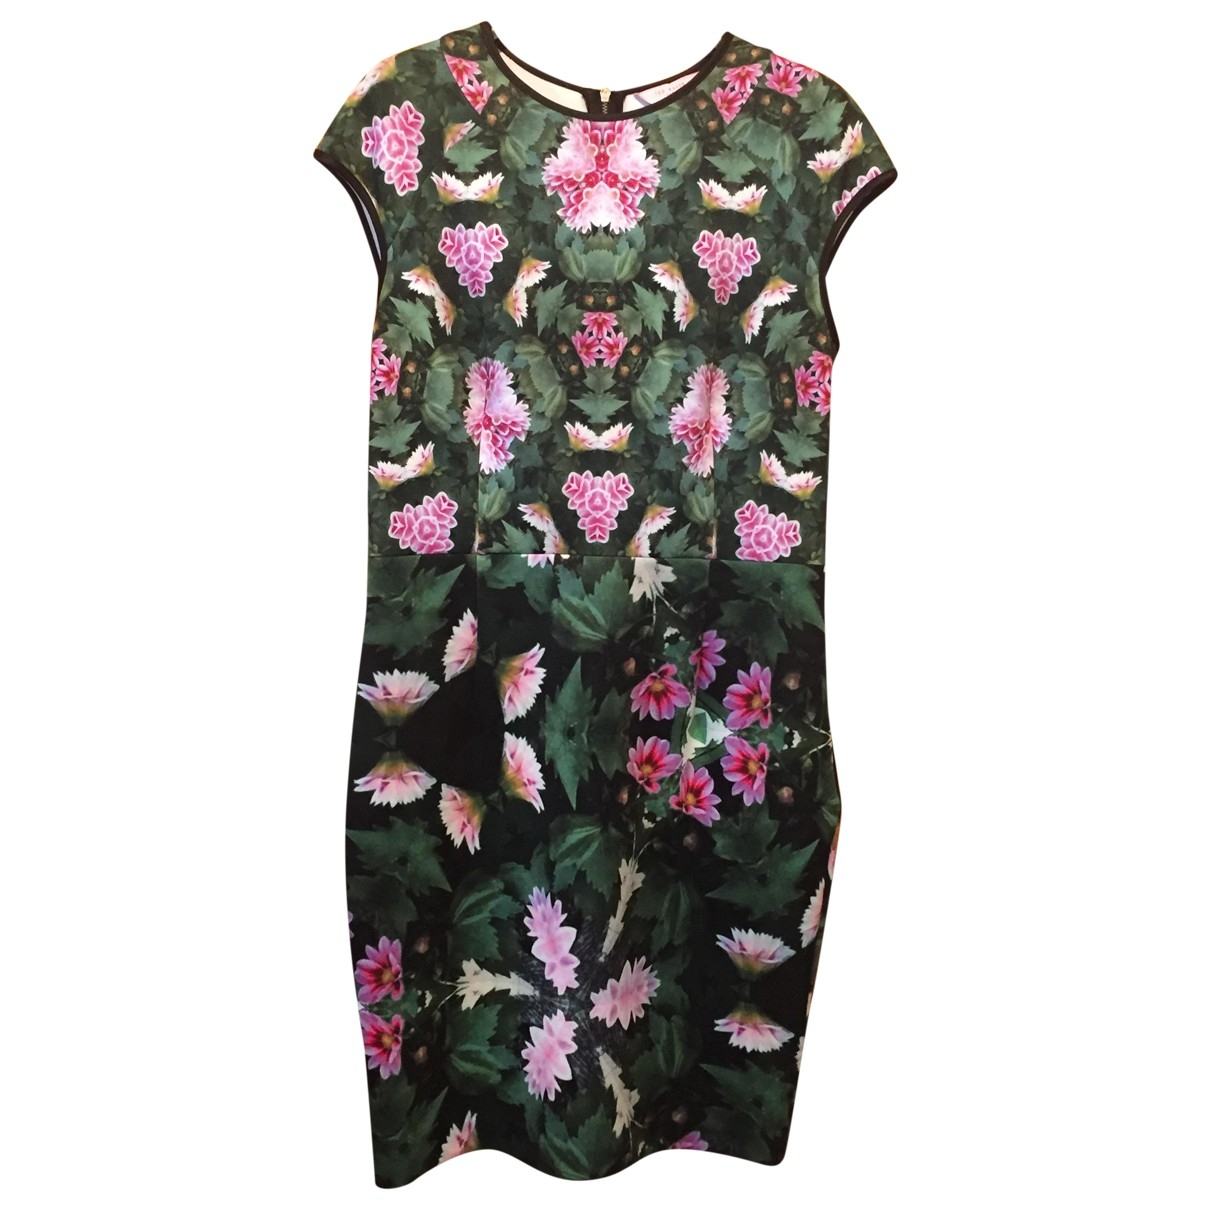 Ted Baker \N Kleid in  Gruen Polyester